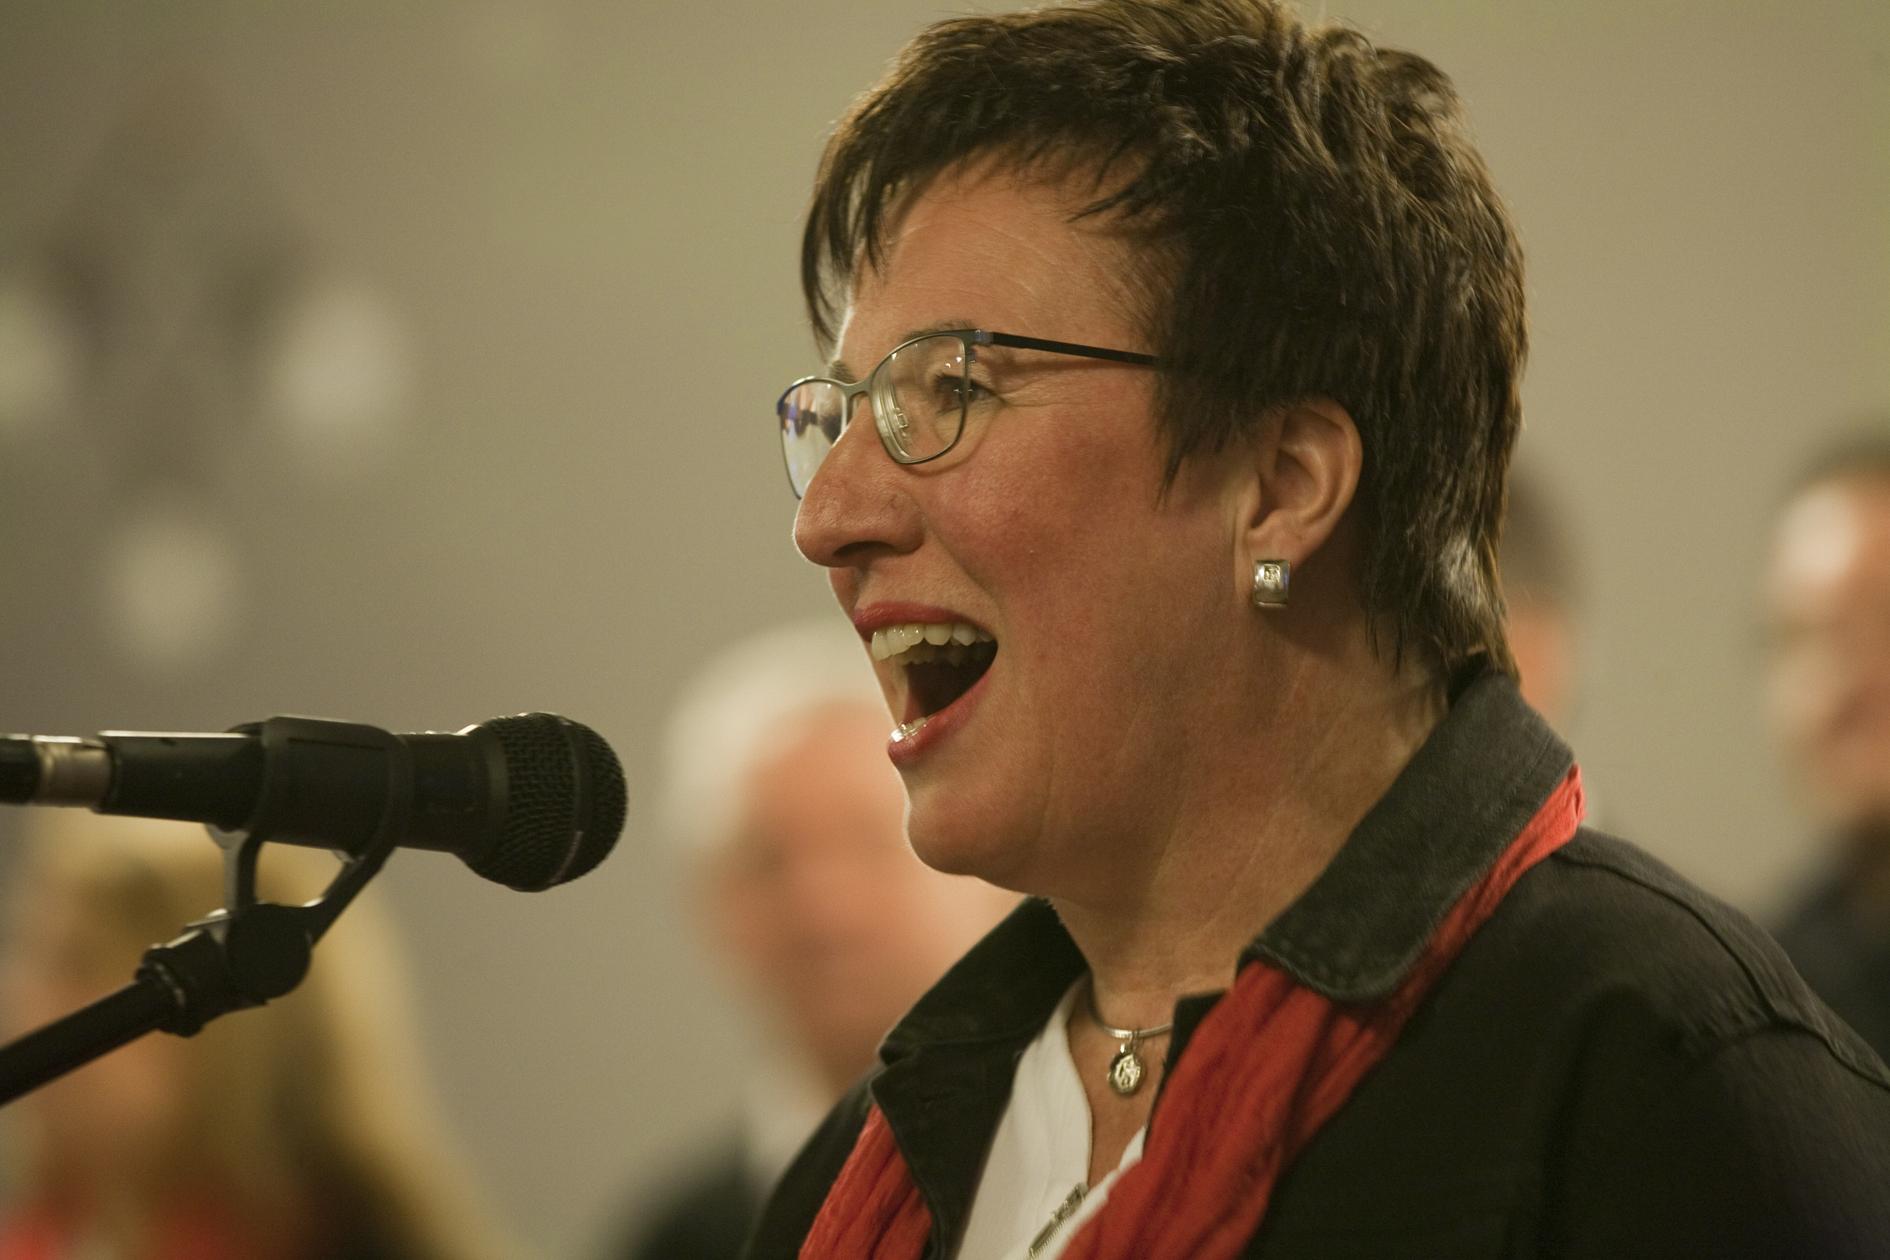 Monika Philippi bei einem Solo, Konzert: Gospel & more, 16.02.20 / Foto: Michael Wiczoreck